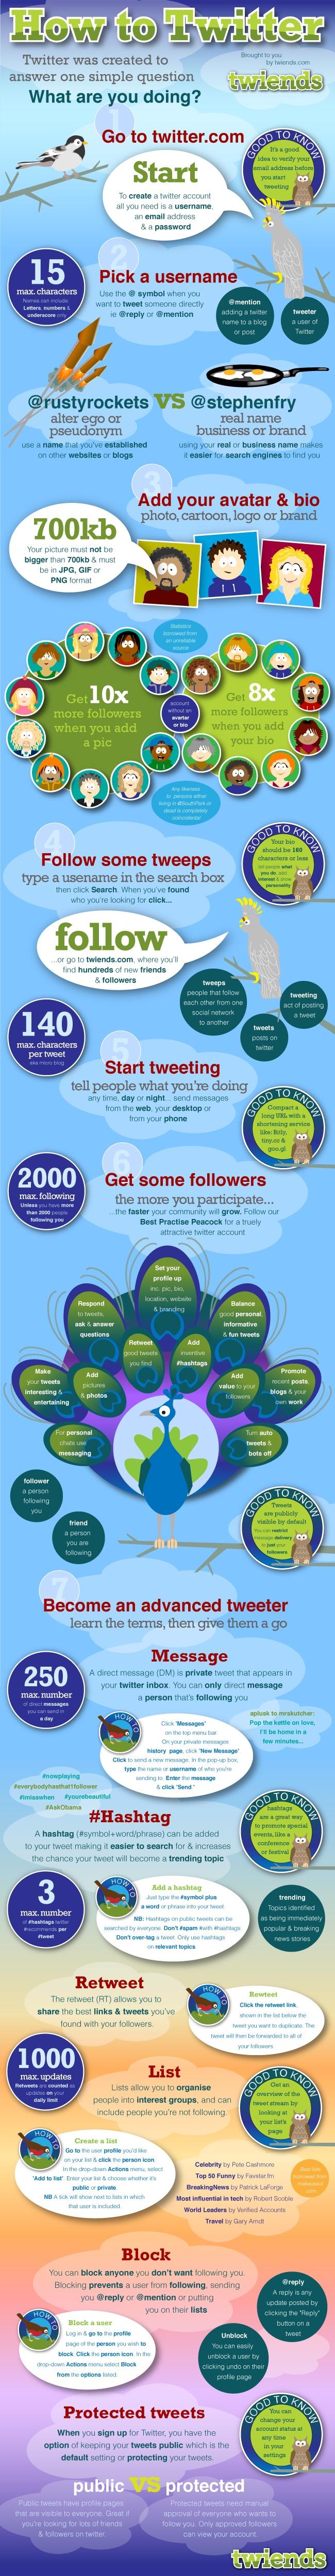 Reference: http://www.mediabistro.com/alltwitter/how-to-twitter-infographic_b12491